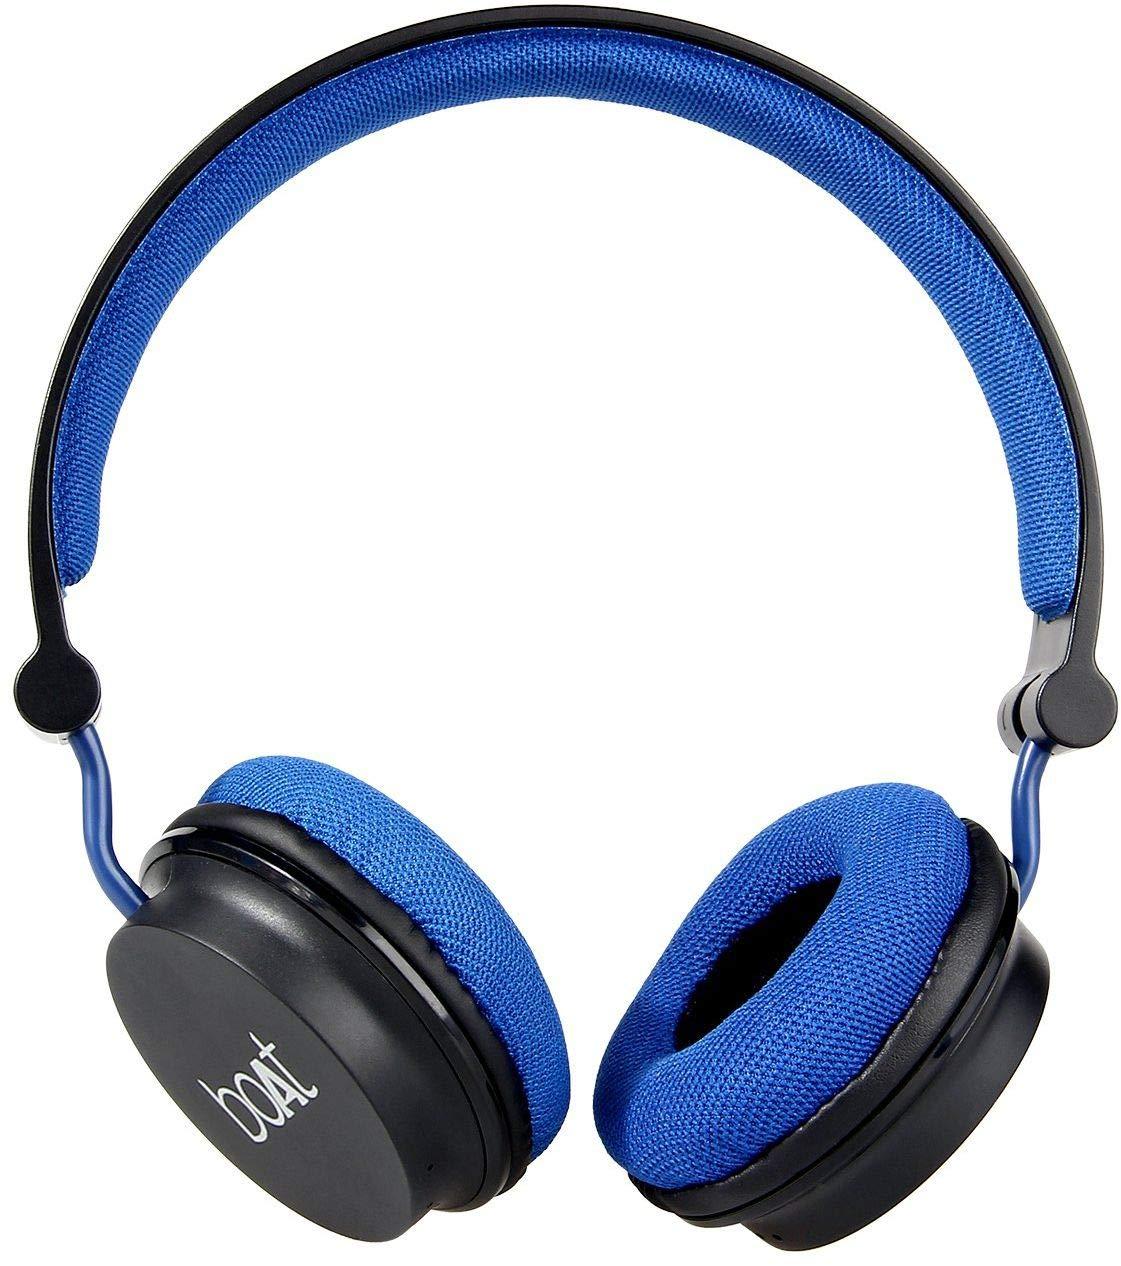 9dc13344e70 Boat Super Bass Rockerz 400 Bluetooth On-Ear Headphones with Mic ...